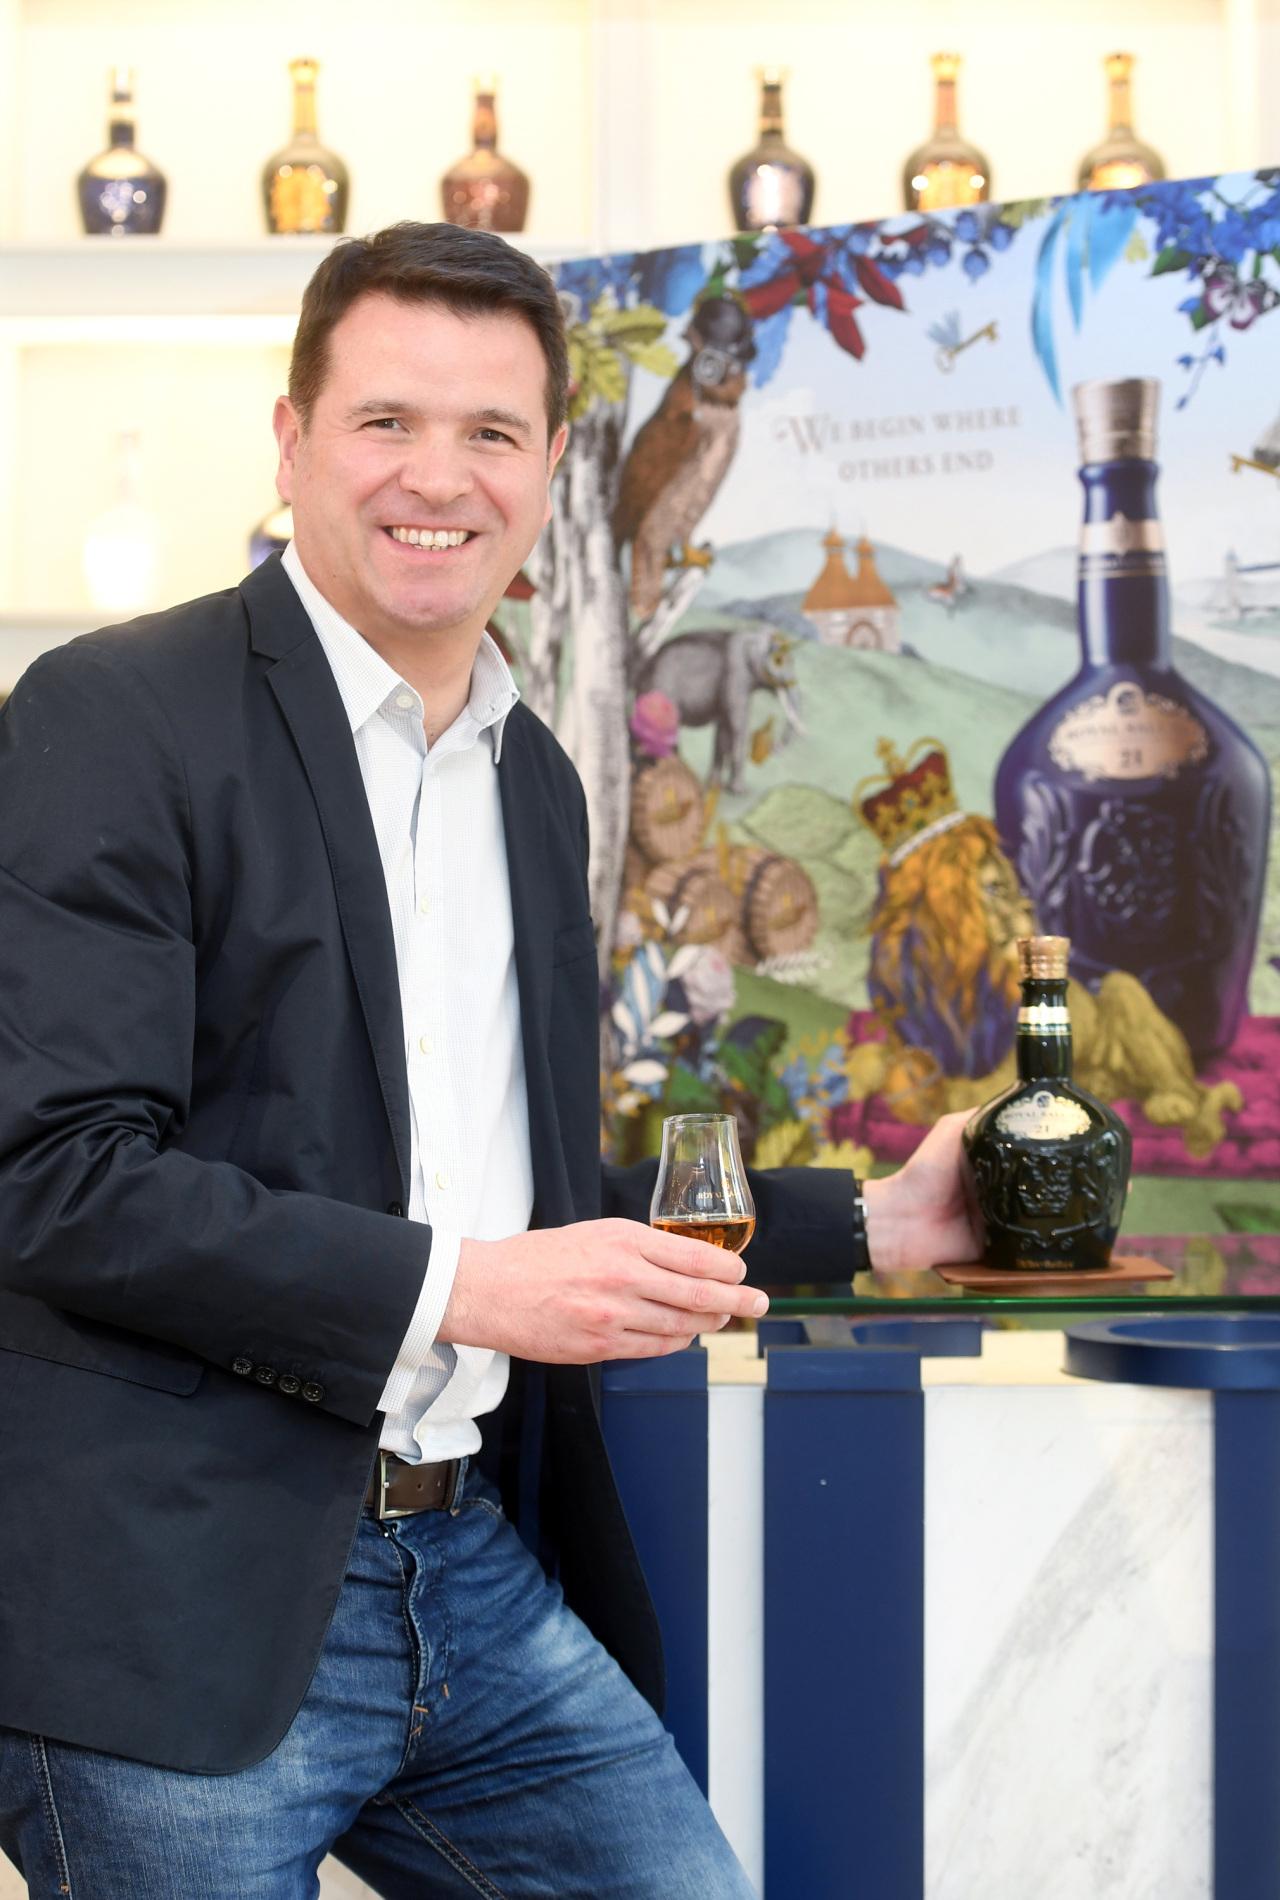 Marketing director Florent Leroi holding the Royal Salute 21YO Malt.(PRK)